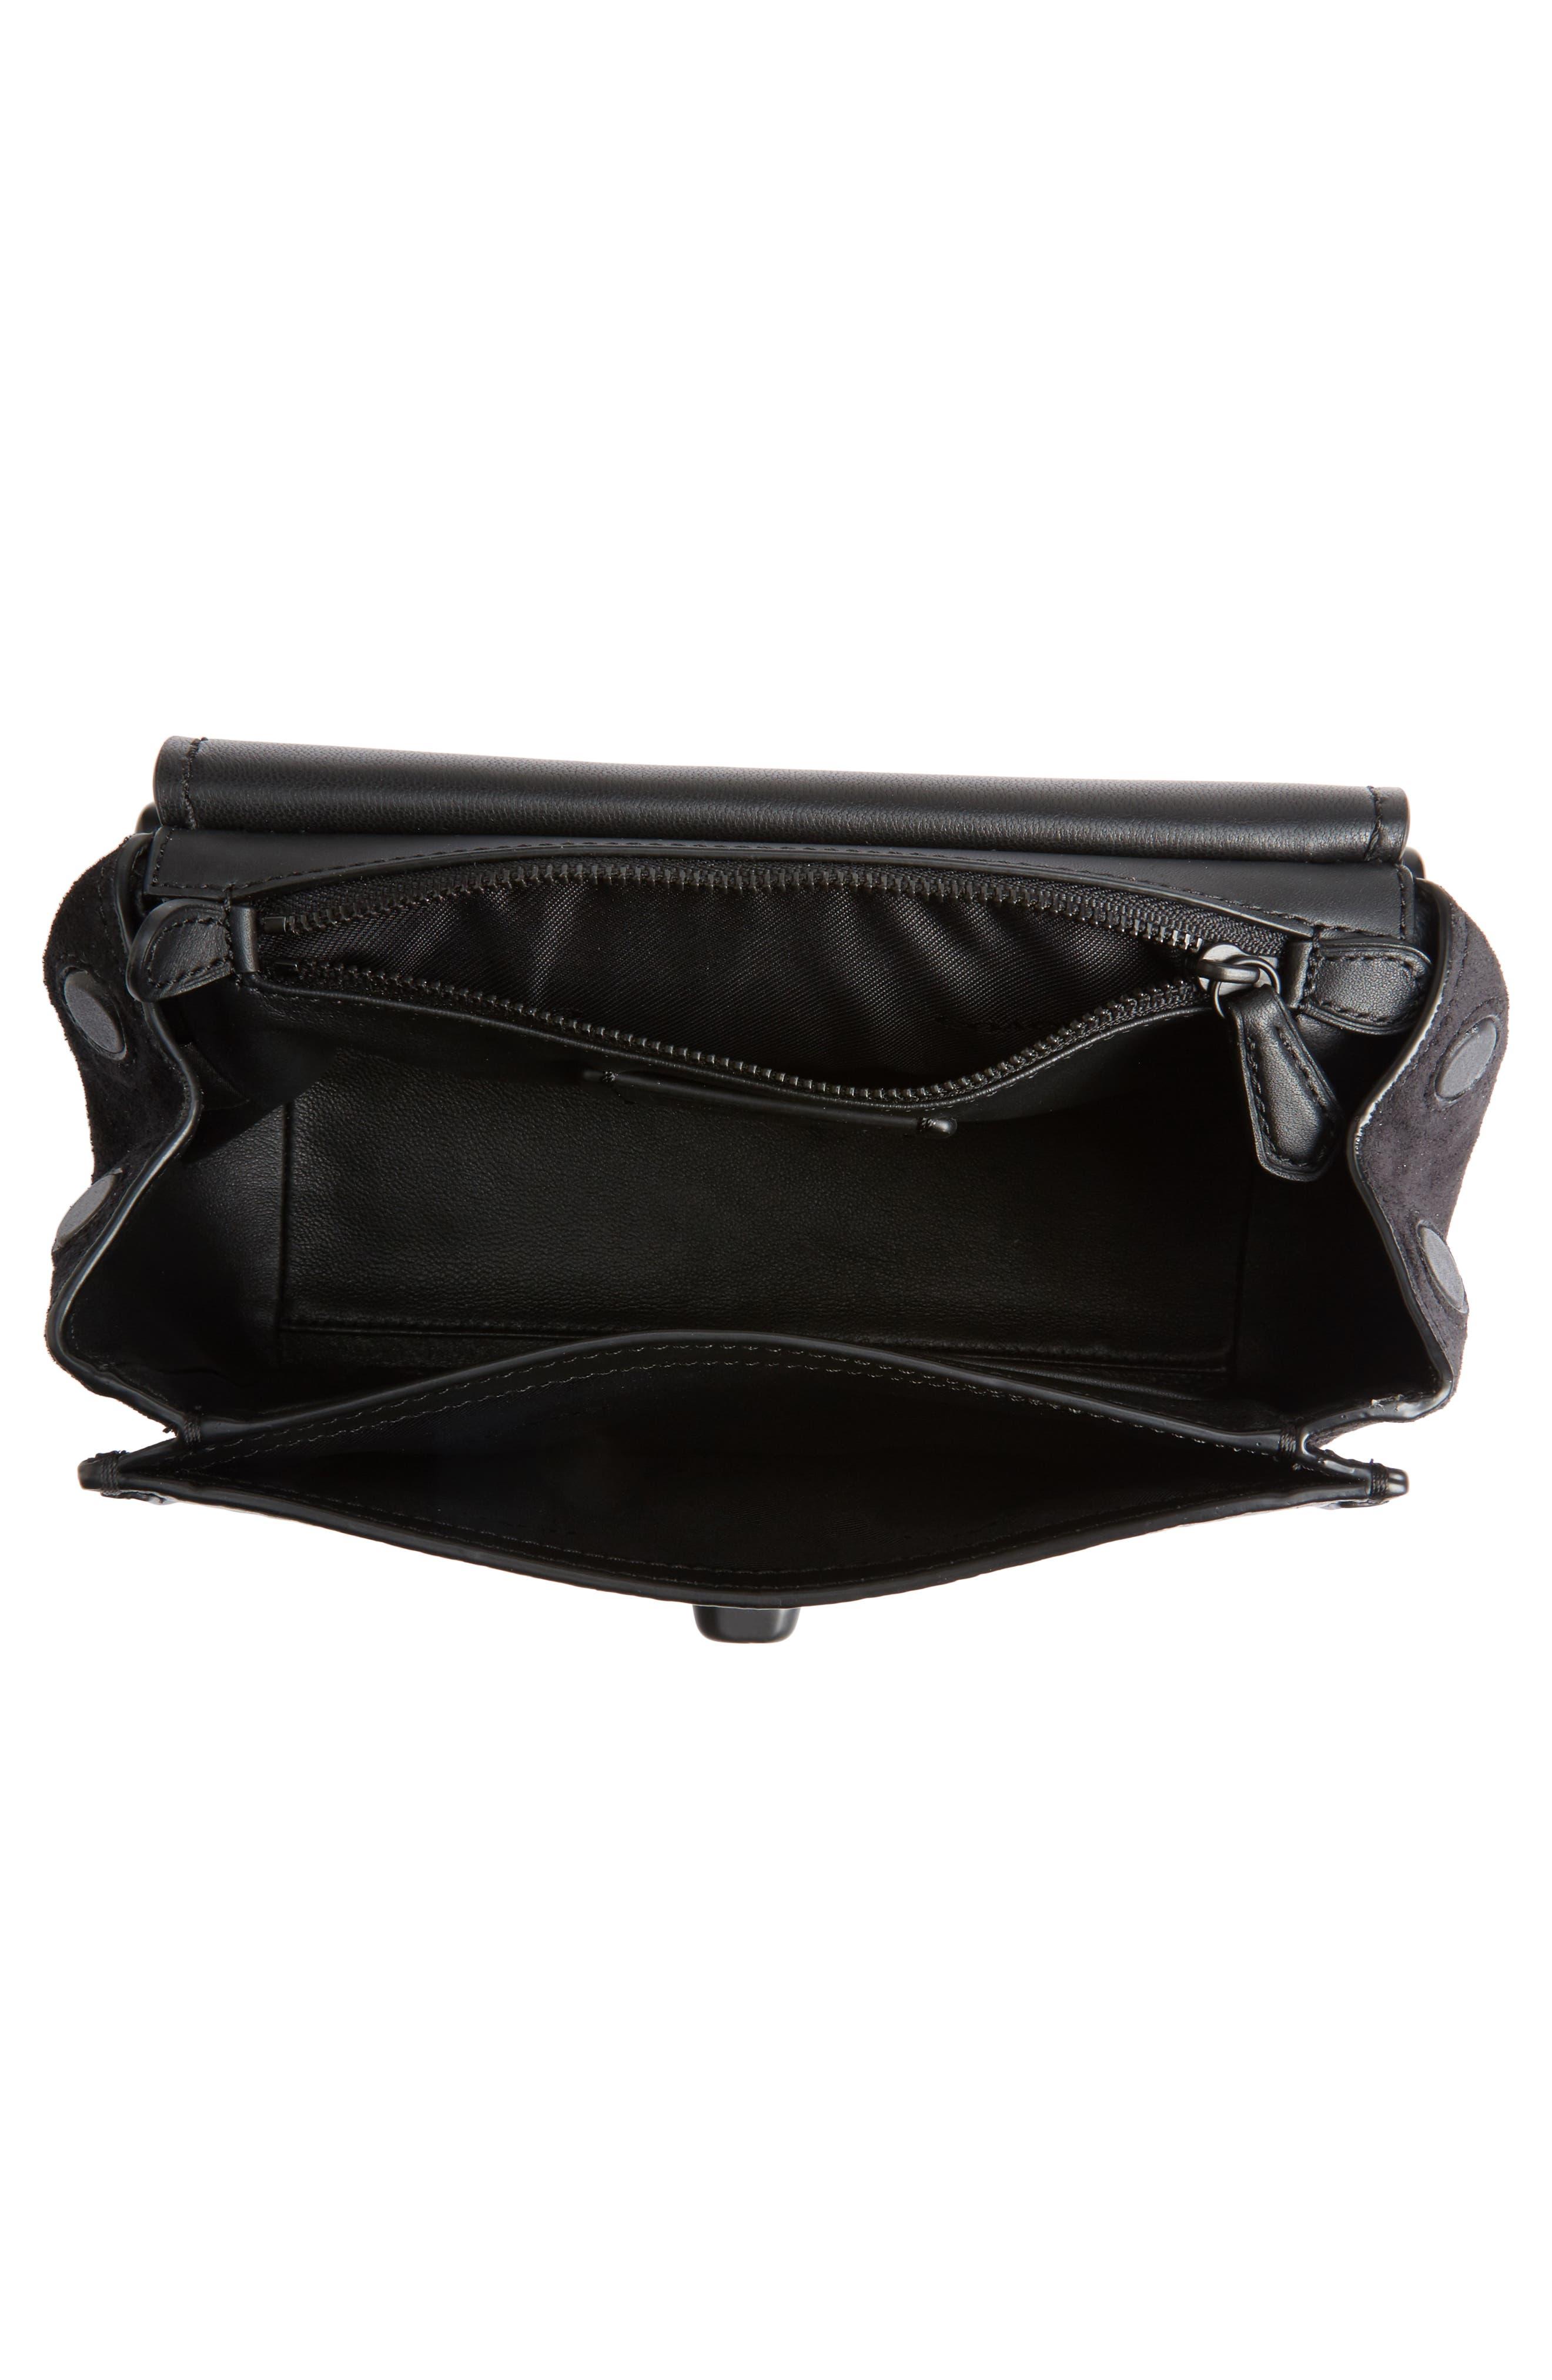 Alternate Image 3  - COACH Mixed Leather Crossbody Bag